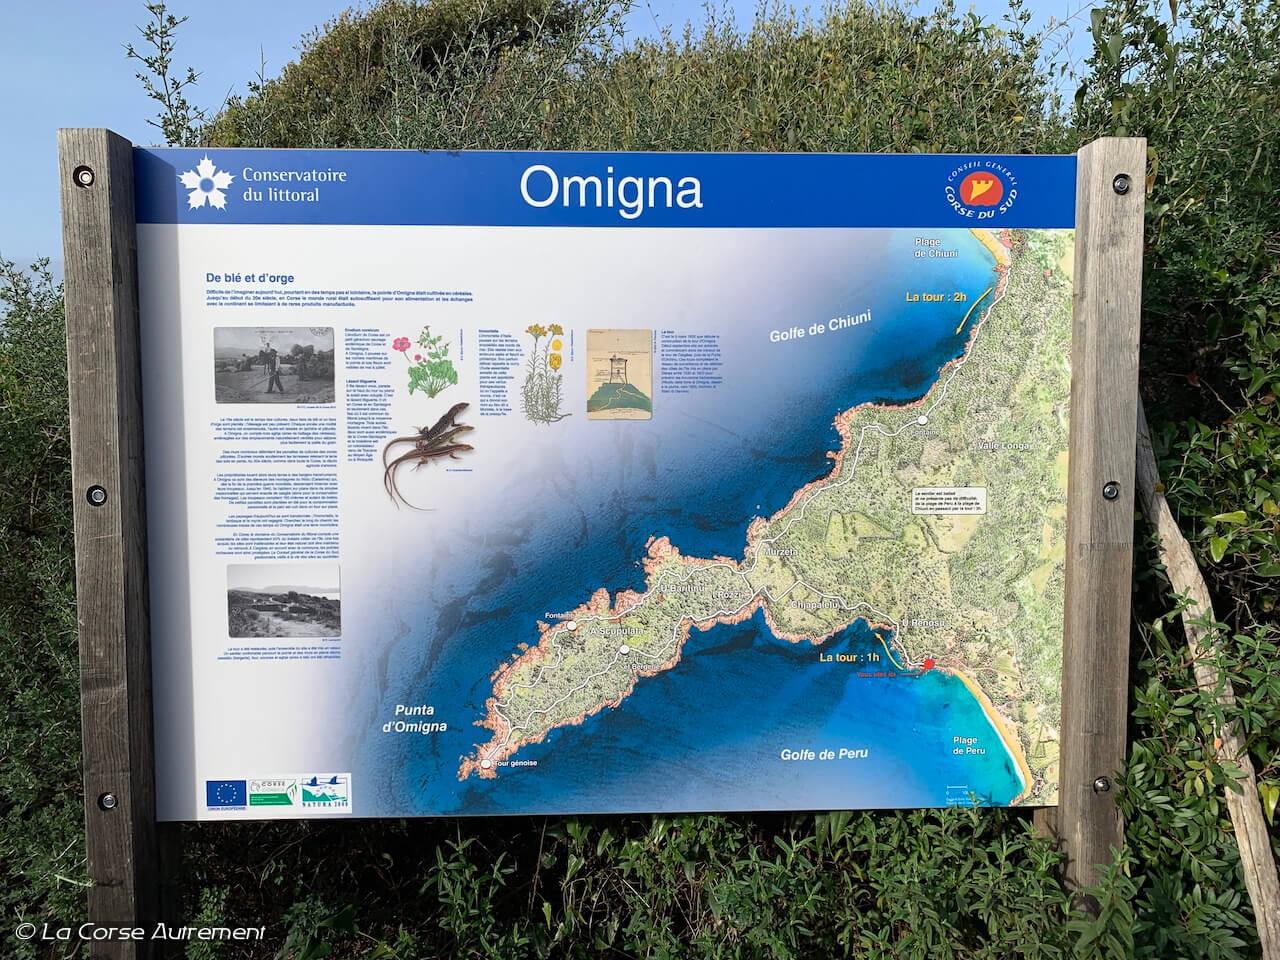 Tour d'Omigna